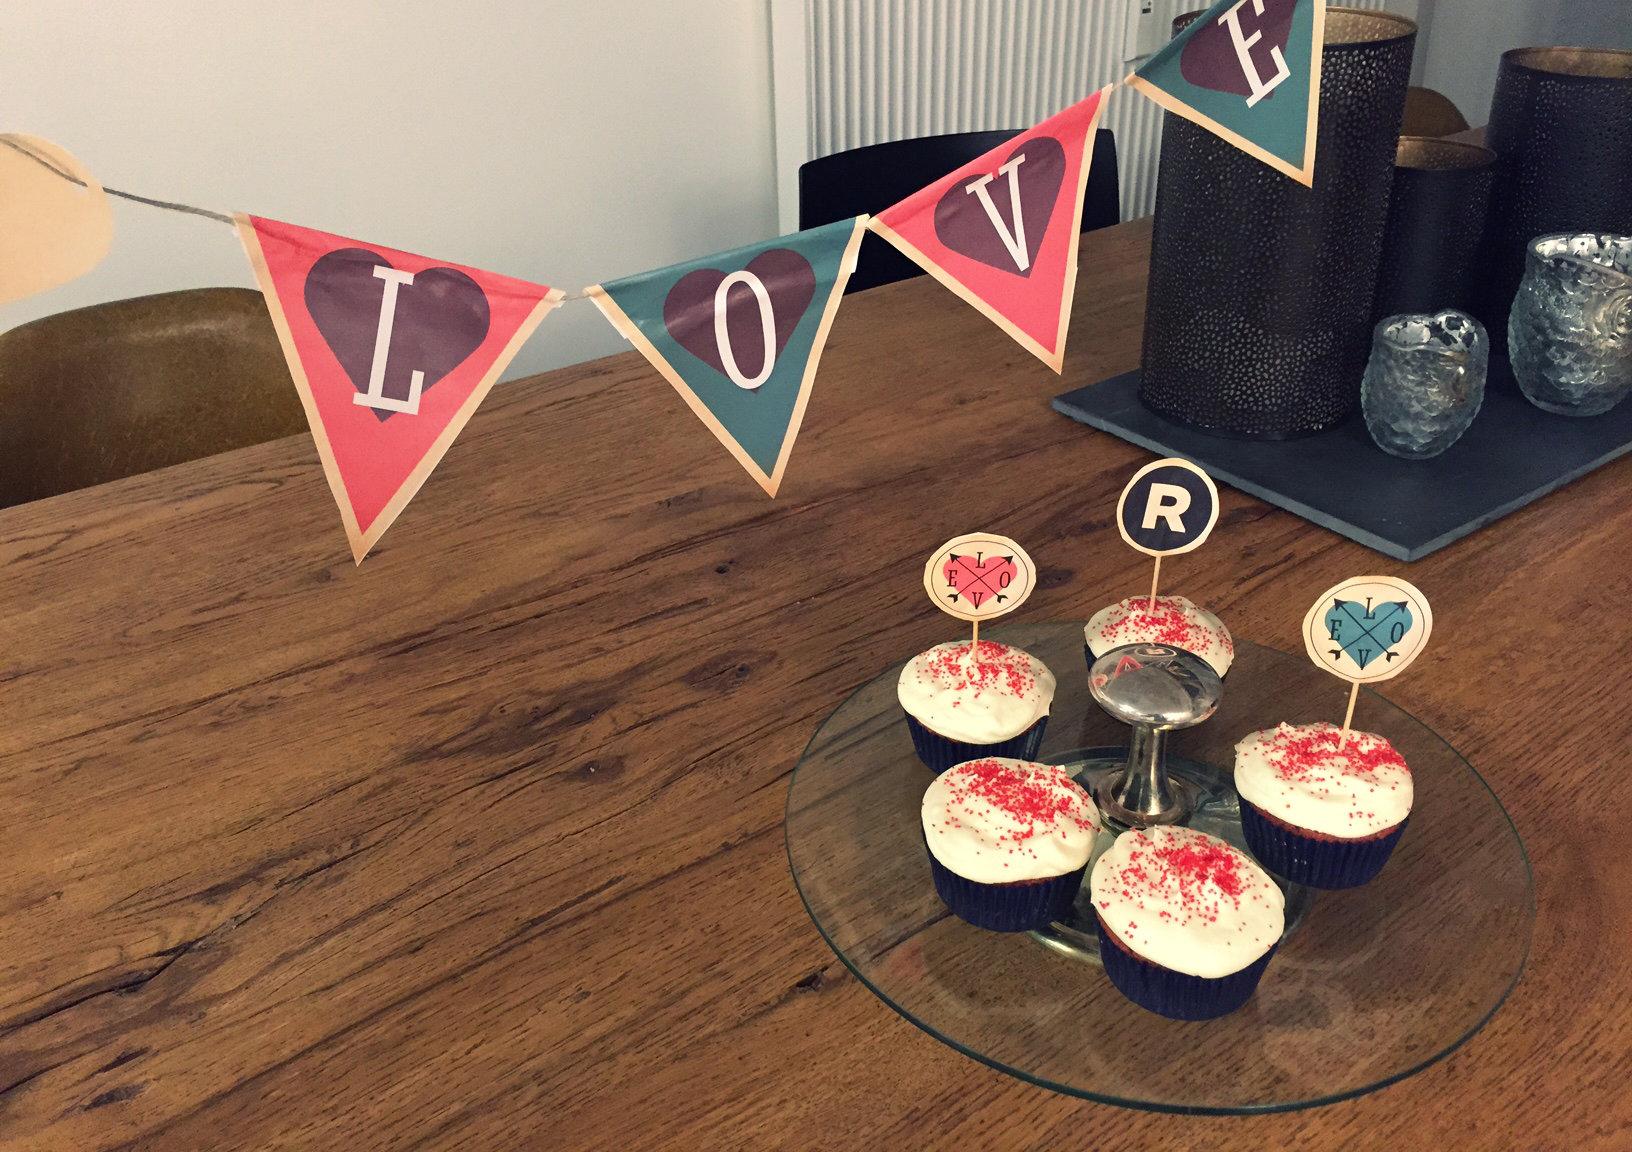 DIY-Valentinstag-Überraschung Cupcakes